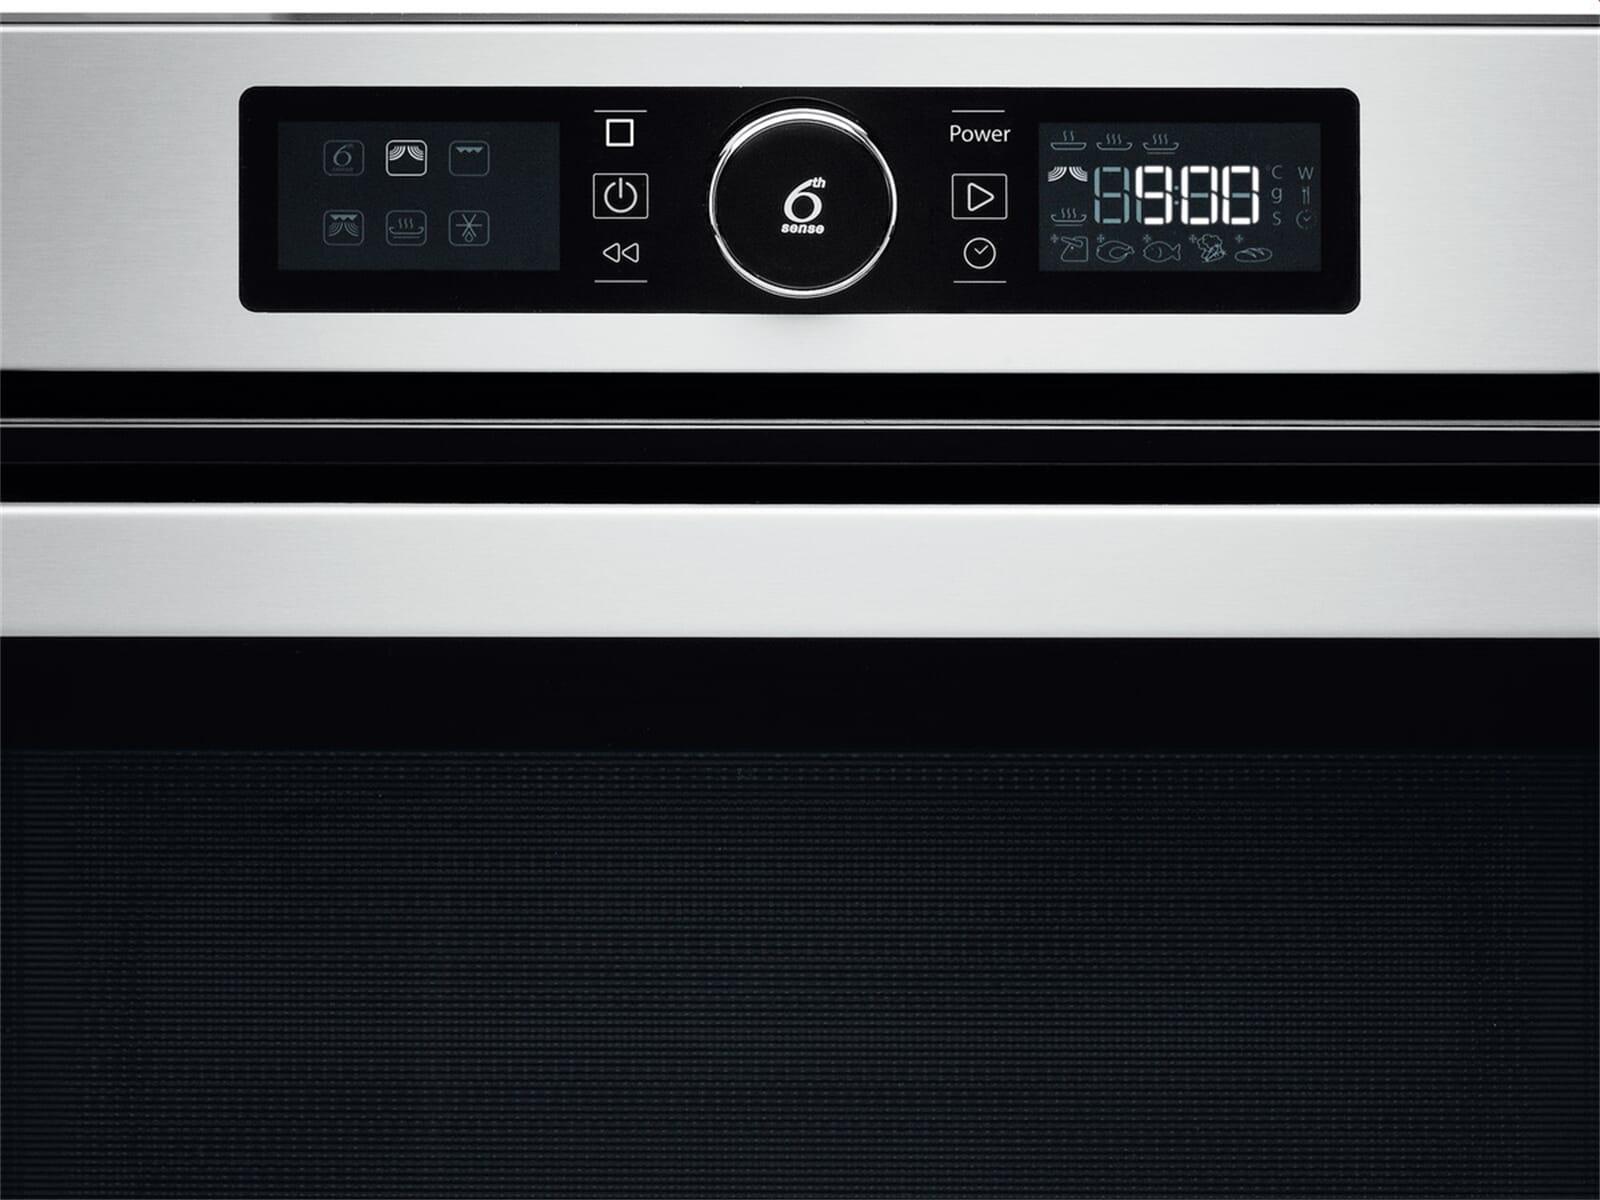 Whirlpool amw 730 ix einbau mikrowelle edelstahl microwell ofen grill microwave ebay - Whirlpool einbau ...